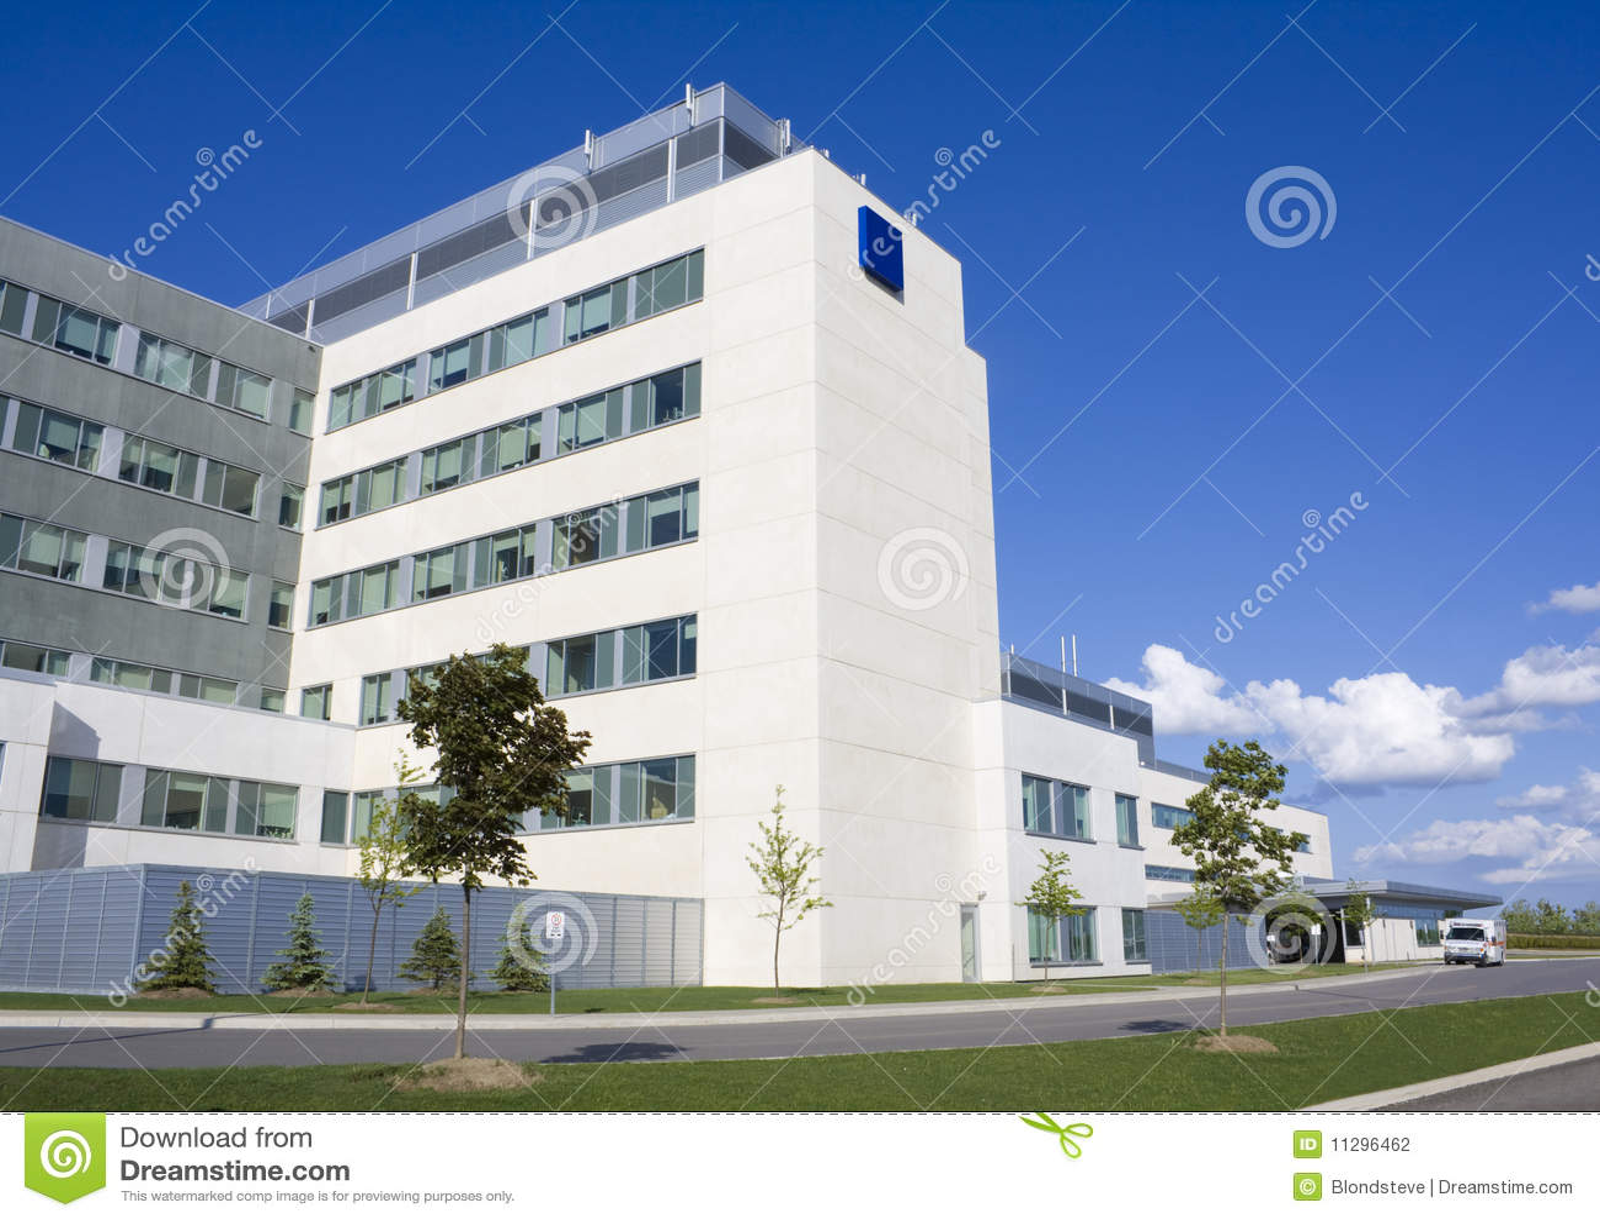 Modern hospital building stock photo image of bright for Modern hospital building design